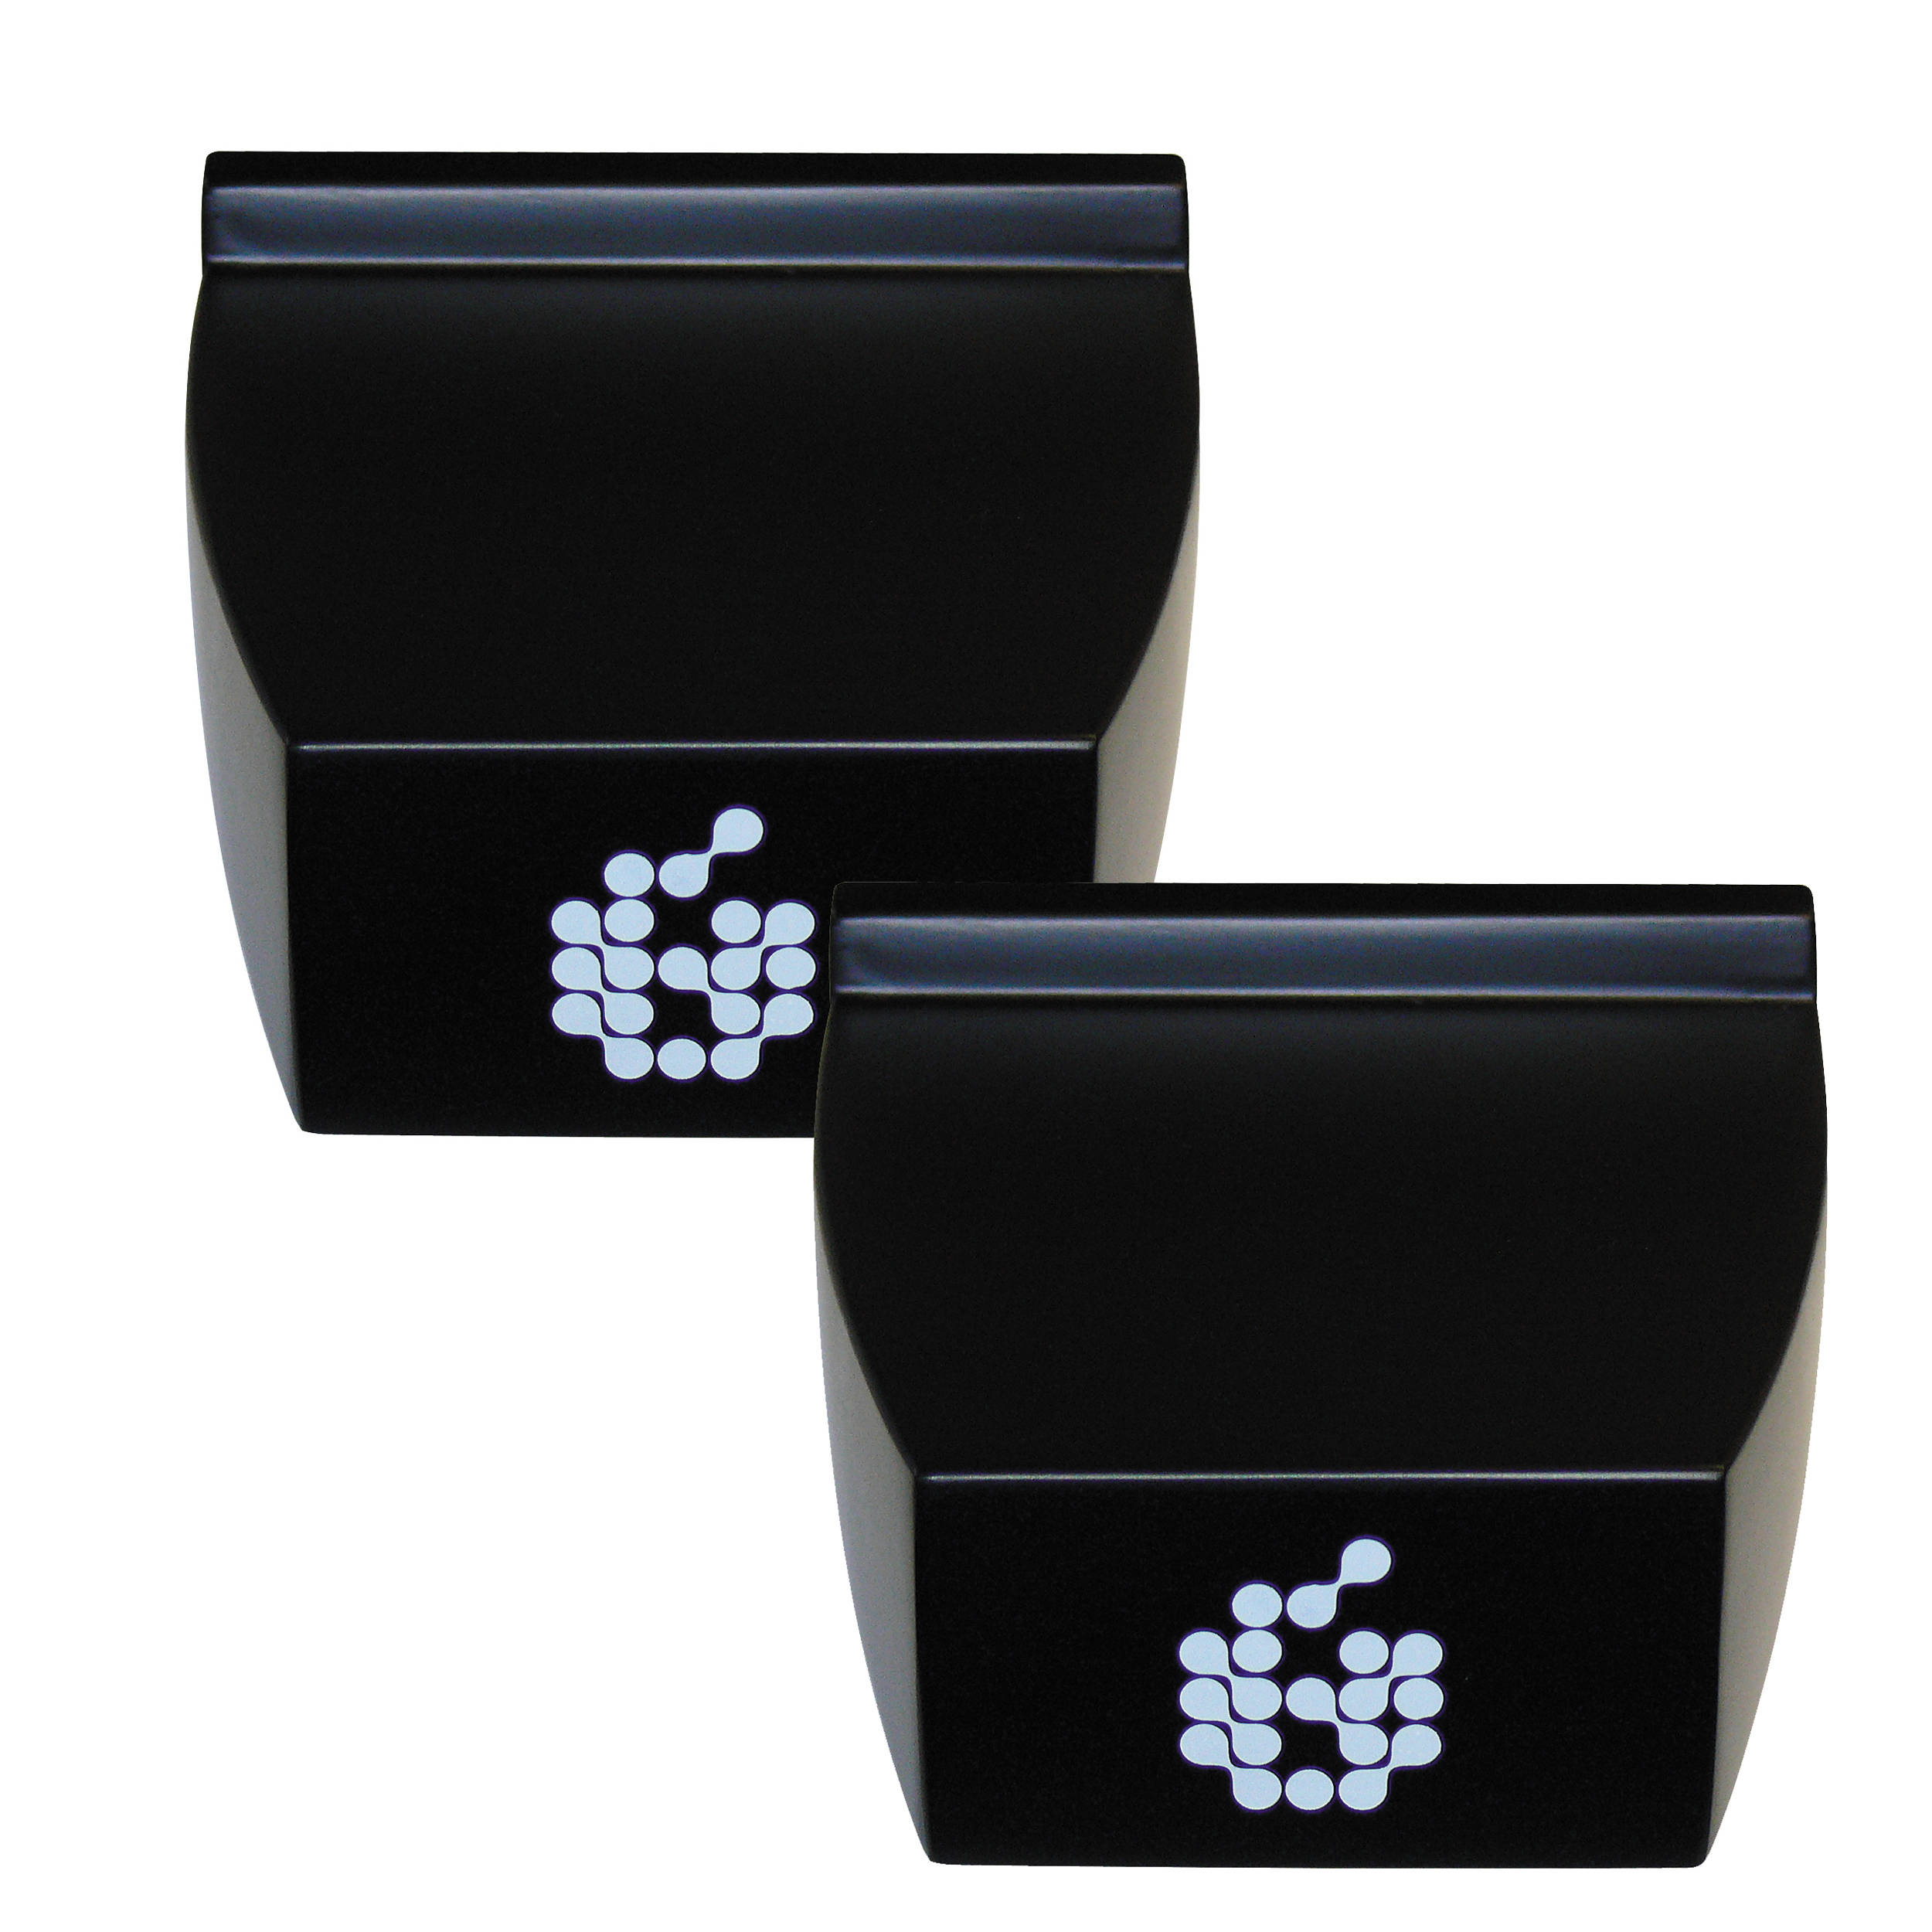 Tremendous Adam Professional Audio A5X Stands Desktop Stands For A5X Monitors Pair Interior Design Ideas Jittwwsoteloinfo